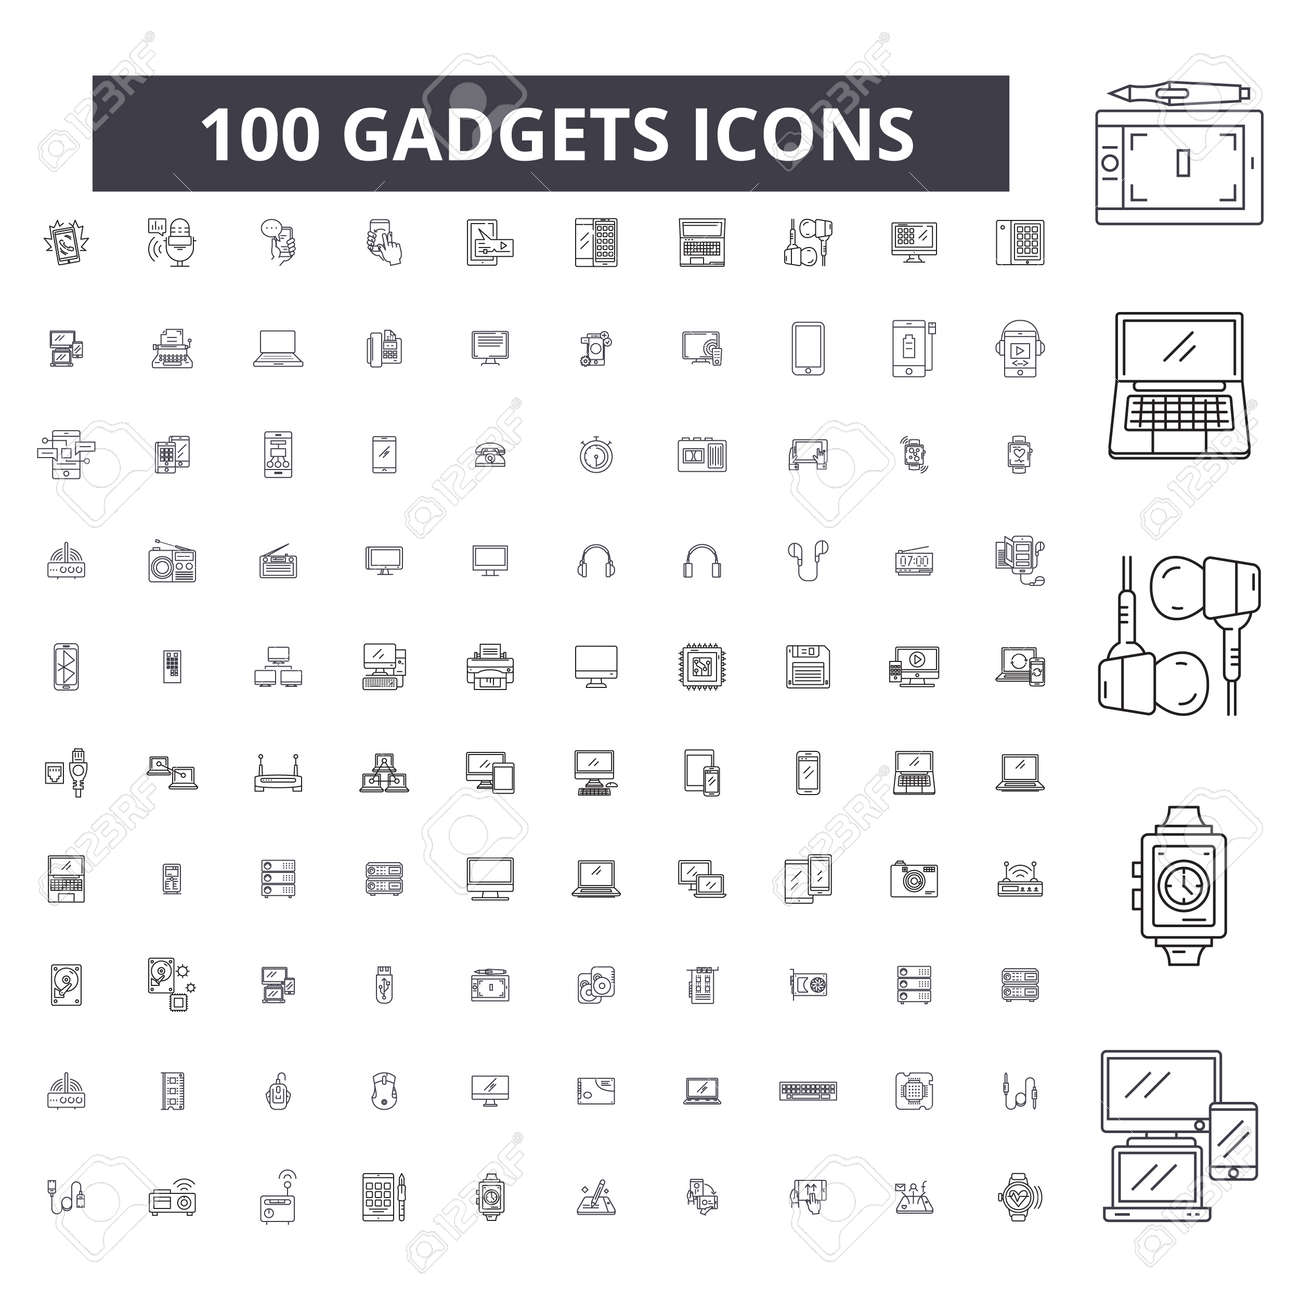 Gadgets editable line icons, 100 vector set on white background. Gadgets black outline illustrations, signs, symbols - 116431318